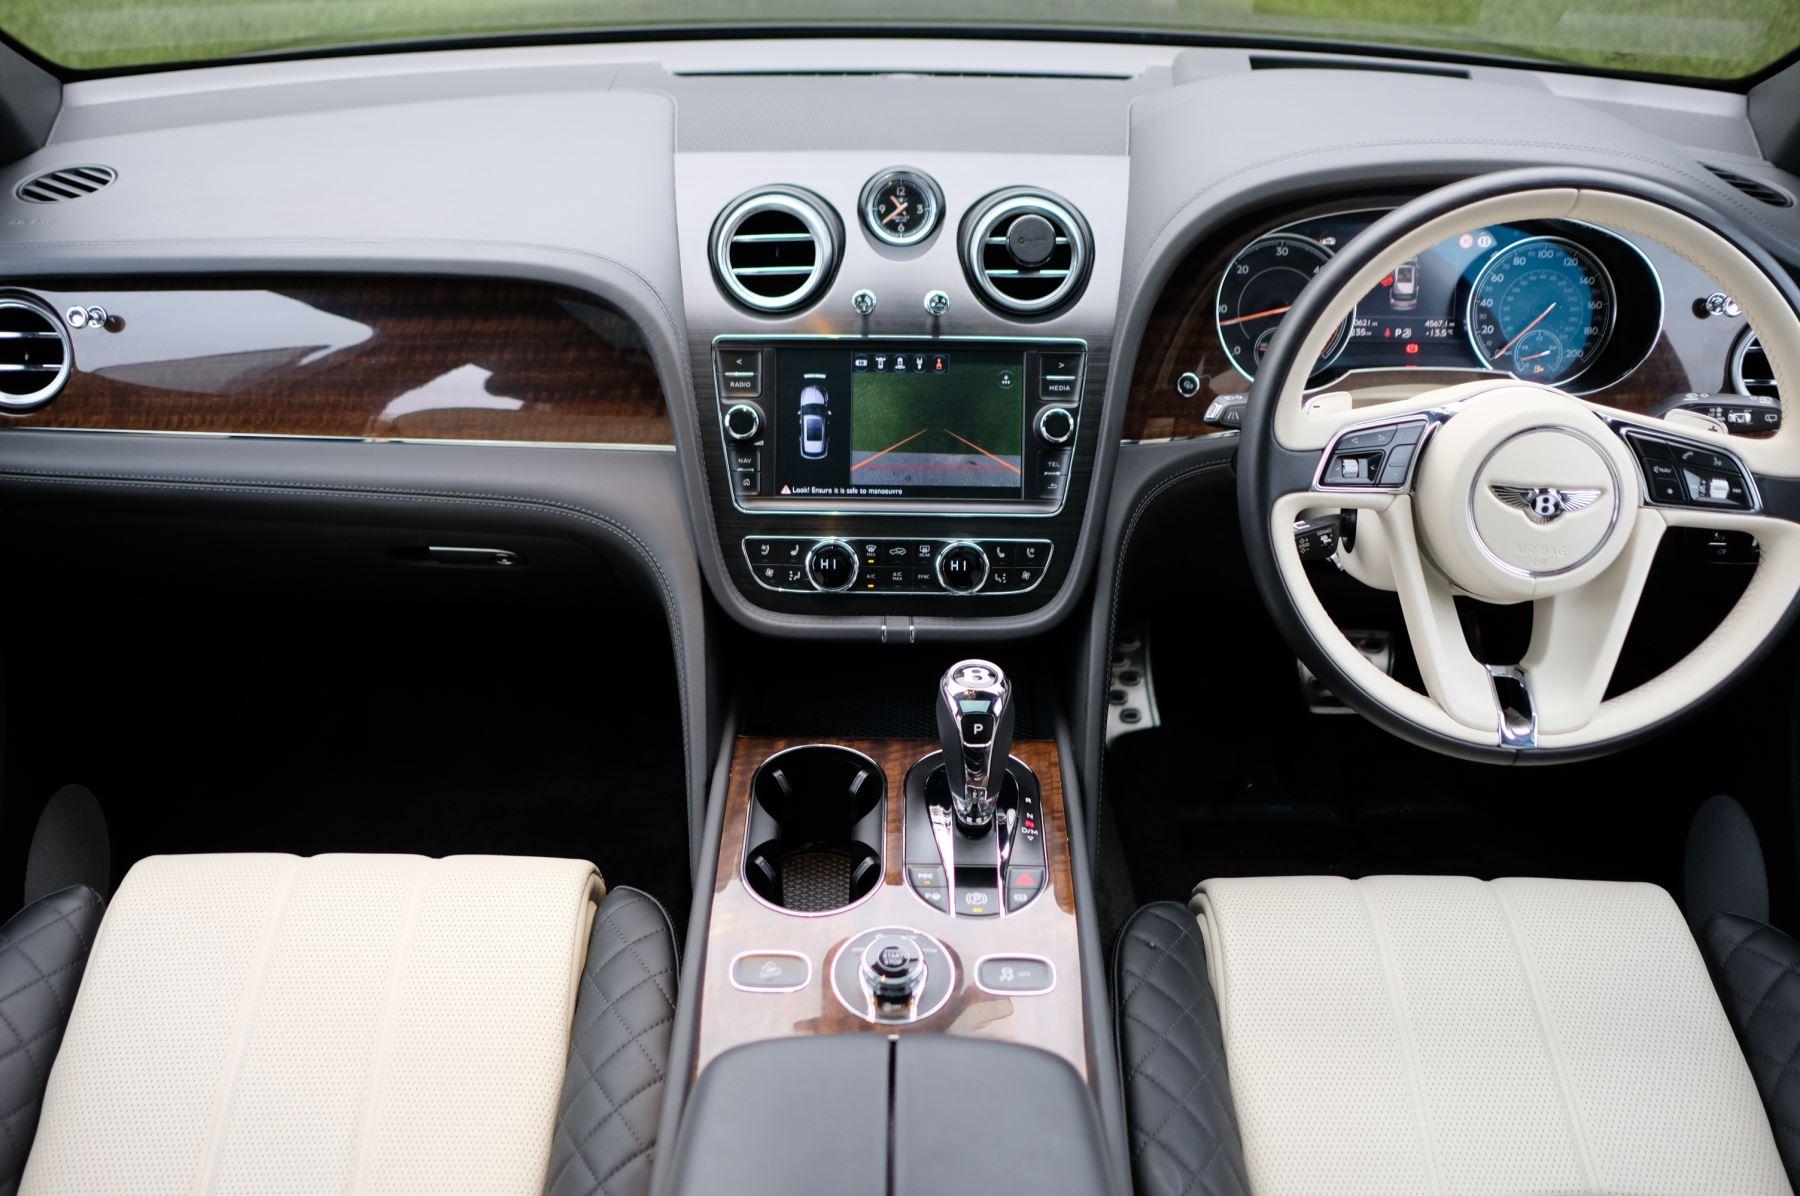 Bentley Bentayga Diesel 4.0 V8 Mulliner Driving Spec 5dr Auto - 7 Seat Specification image 13